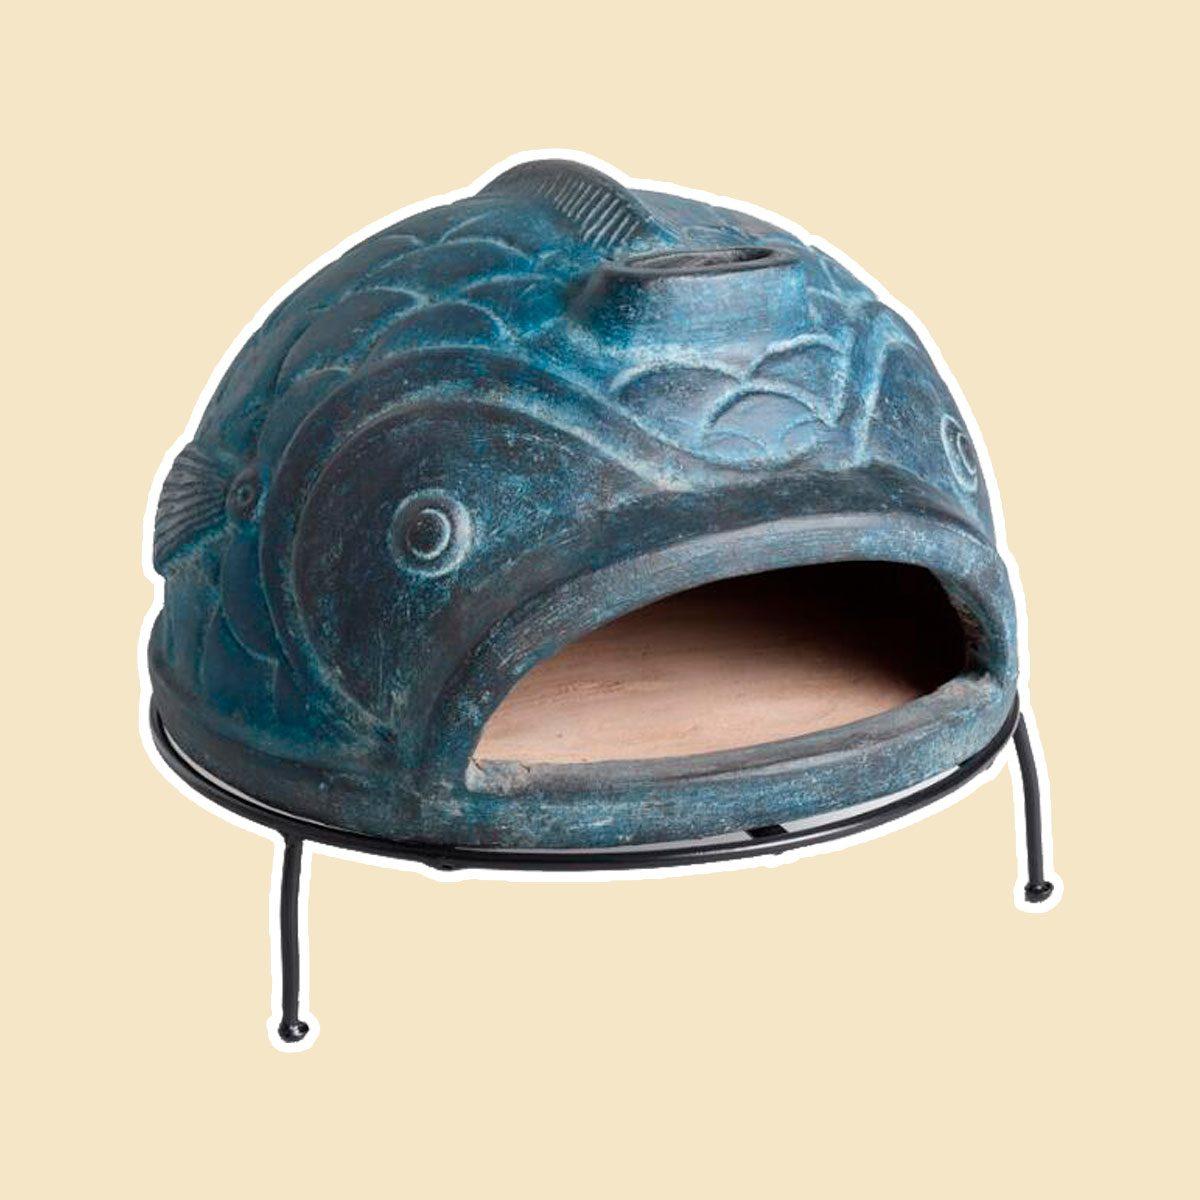 Blue Fish Terracotta Pizza Oven